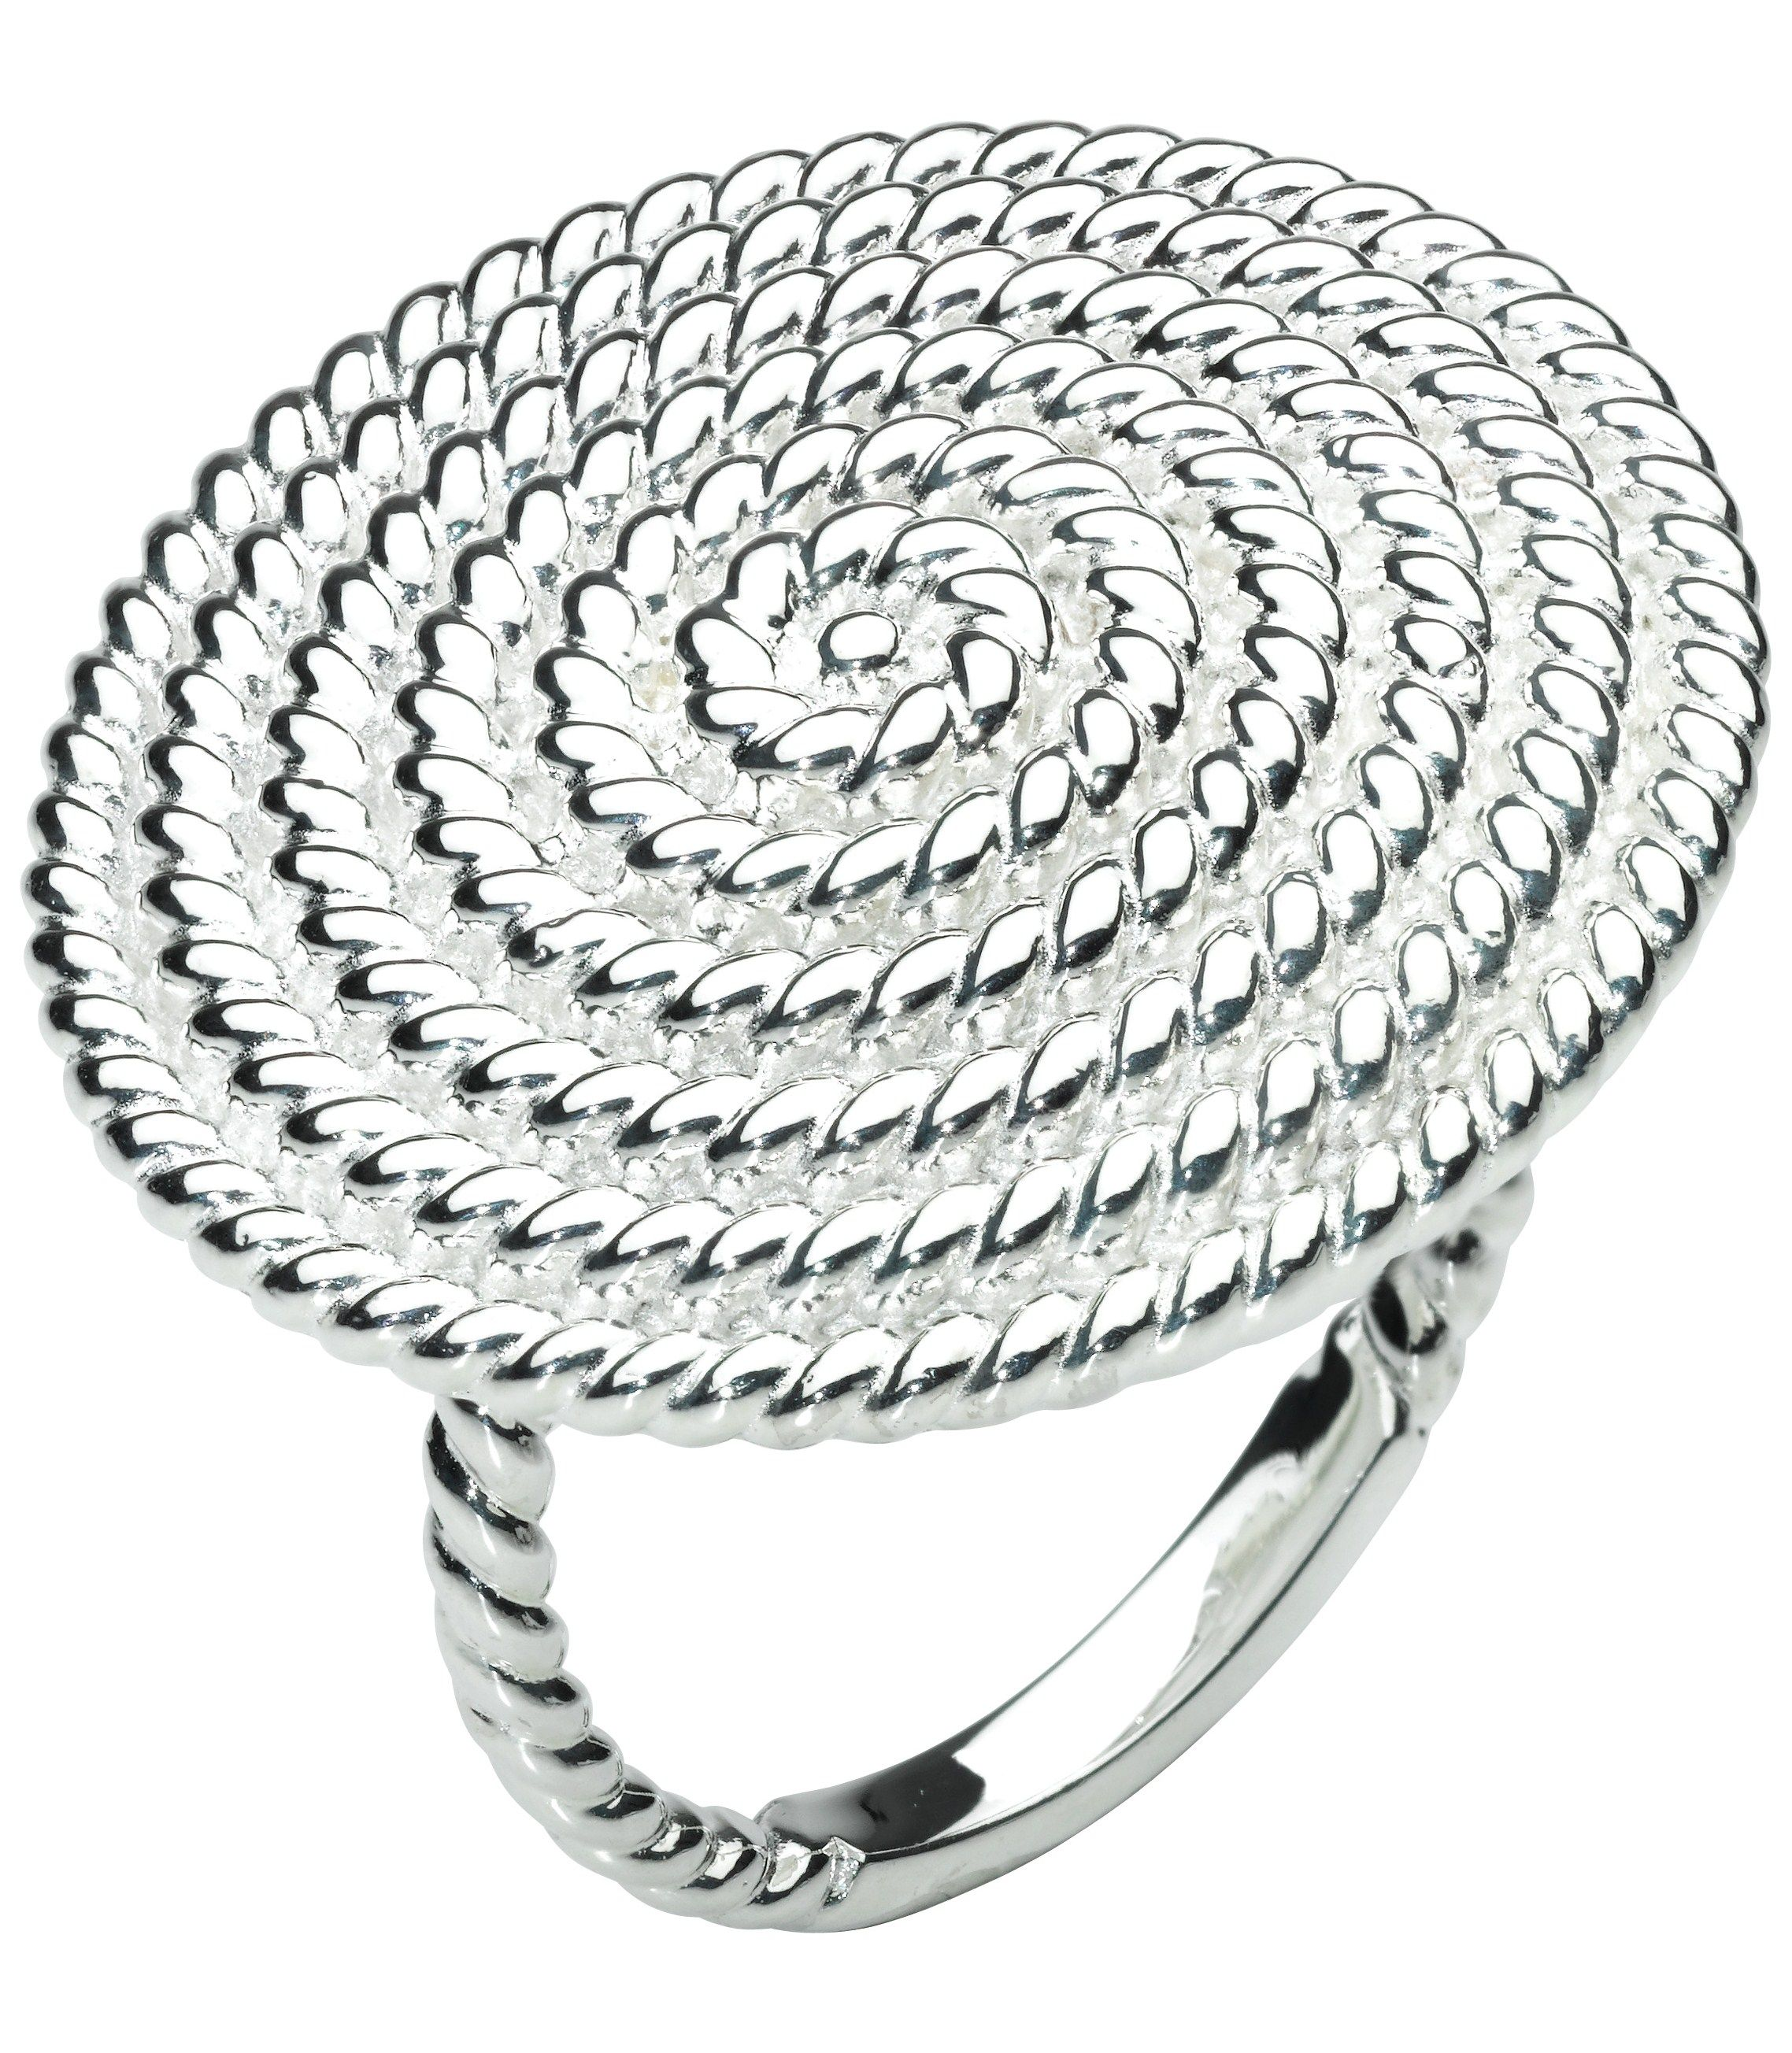 Kit Heath Large Ravel Ring